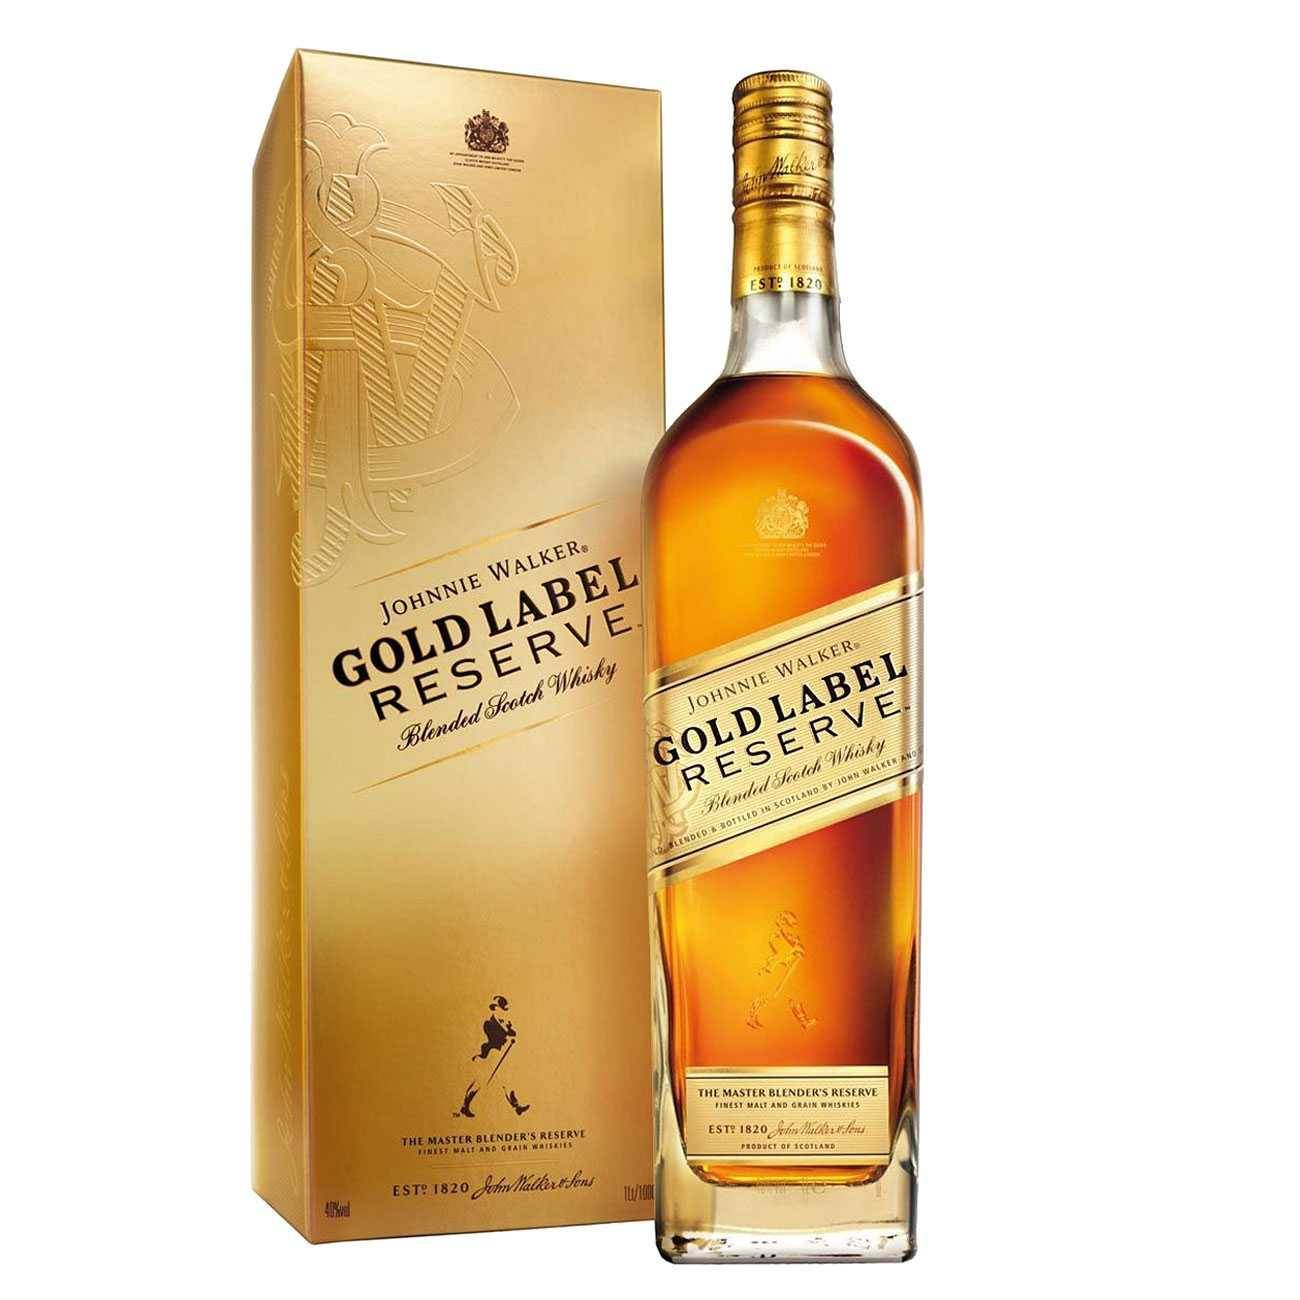 Виски johnnie walker gold label (джонни уокер голд лейбл) и его особенности